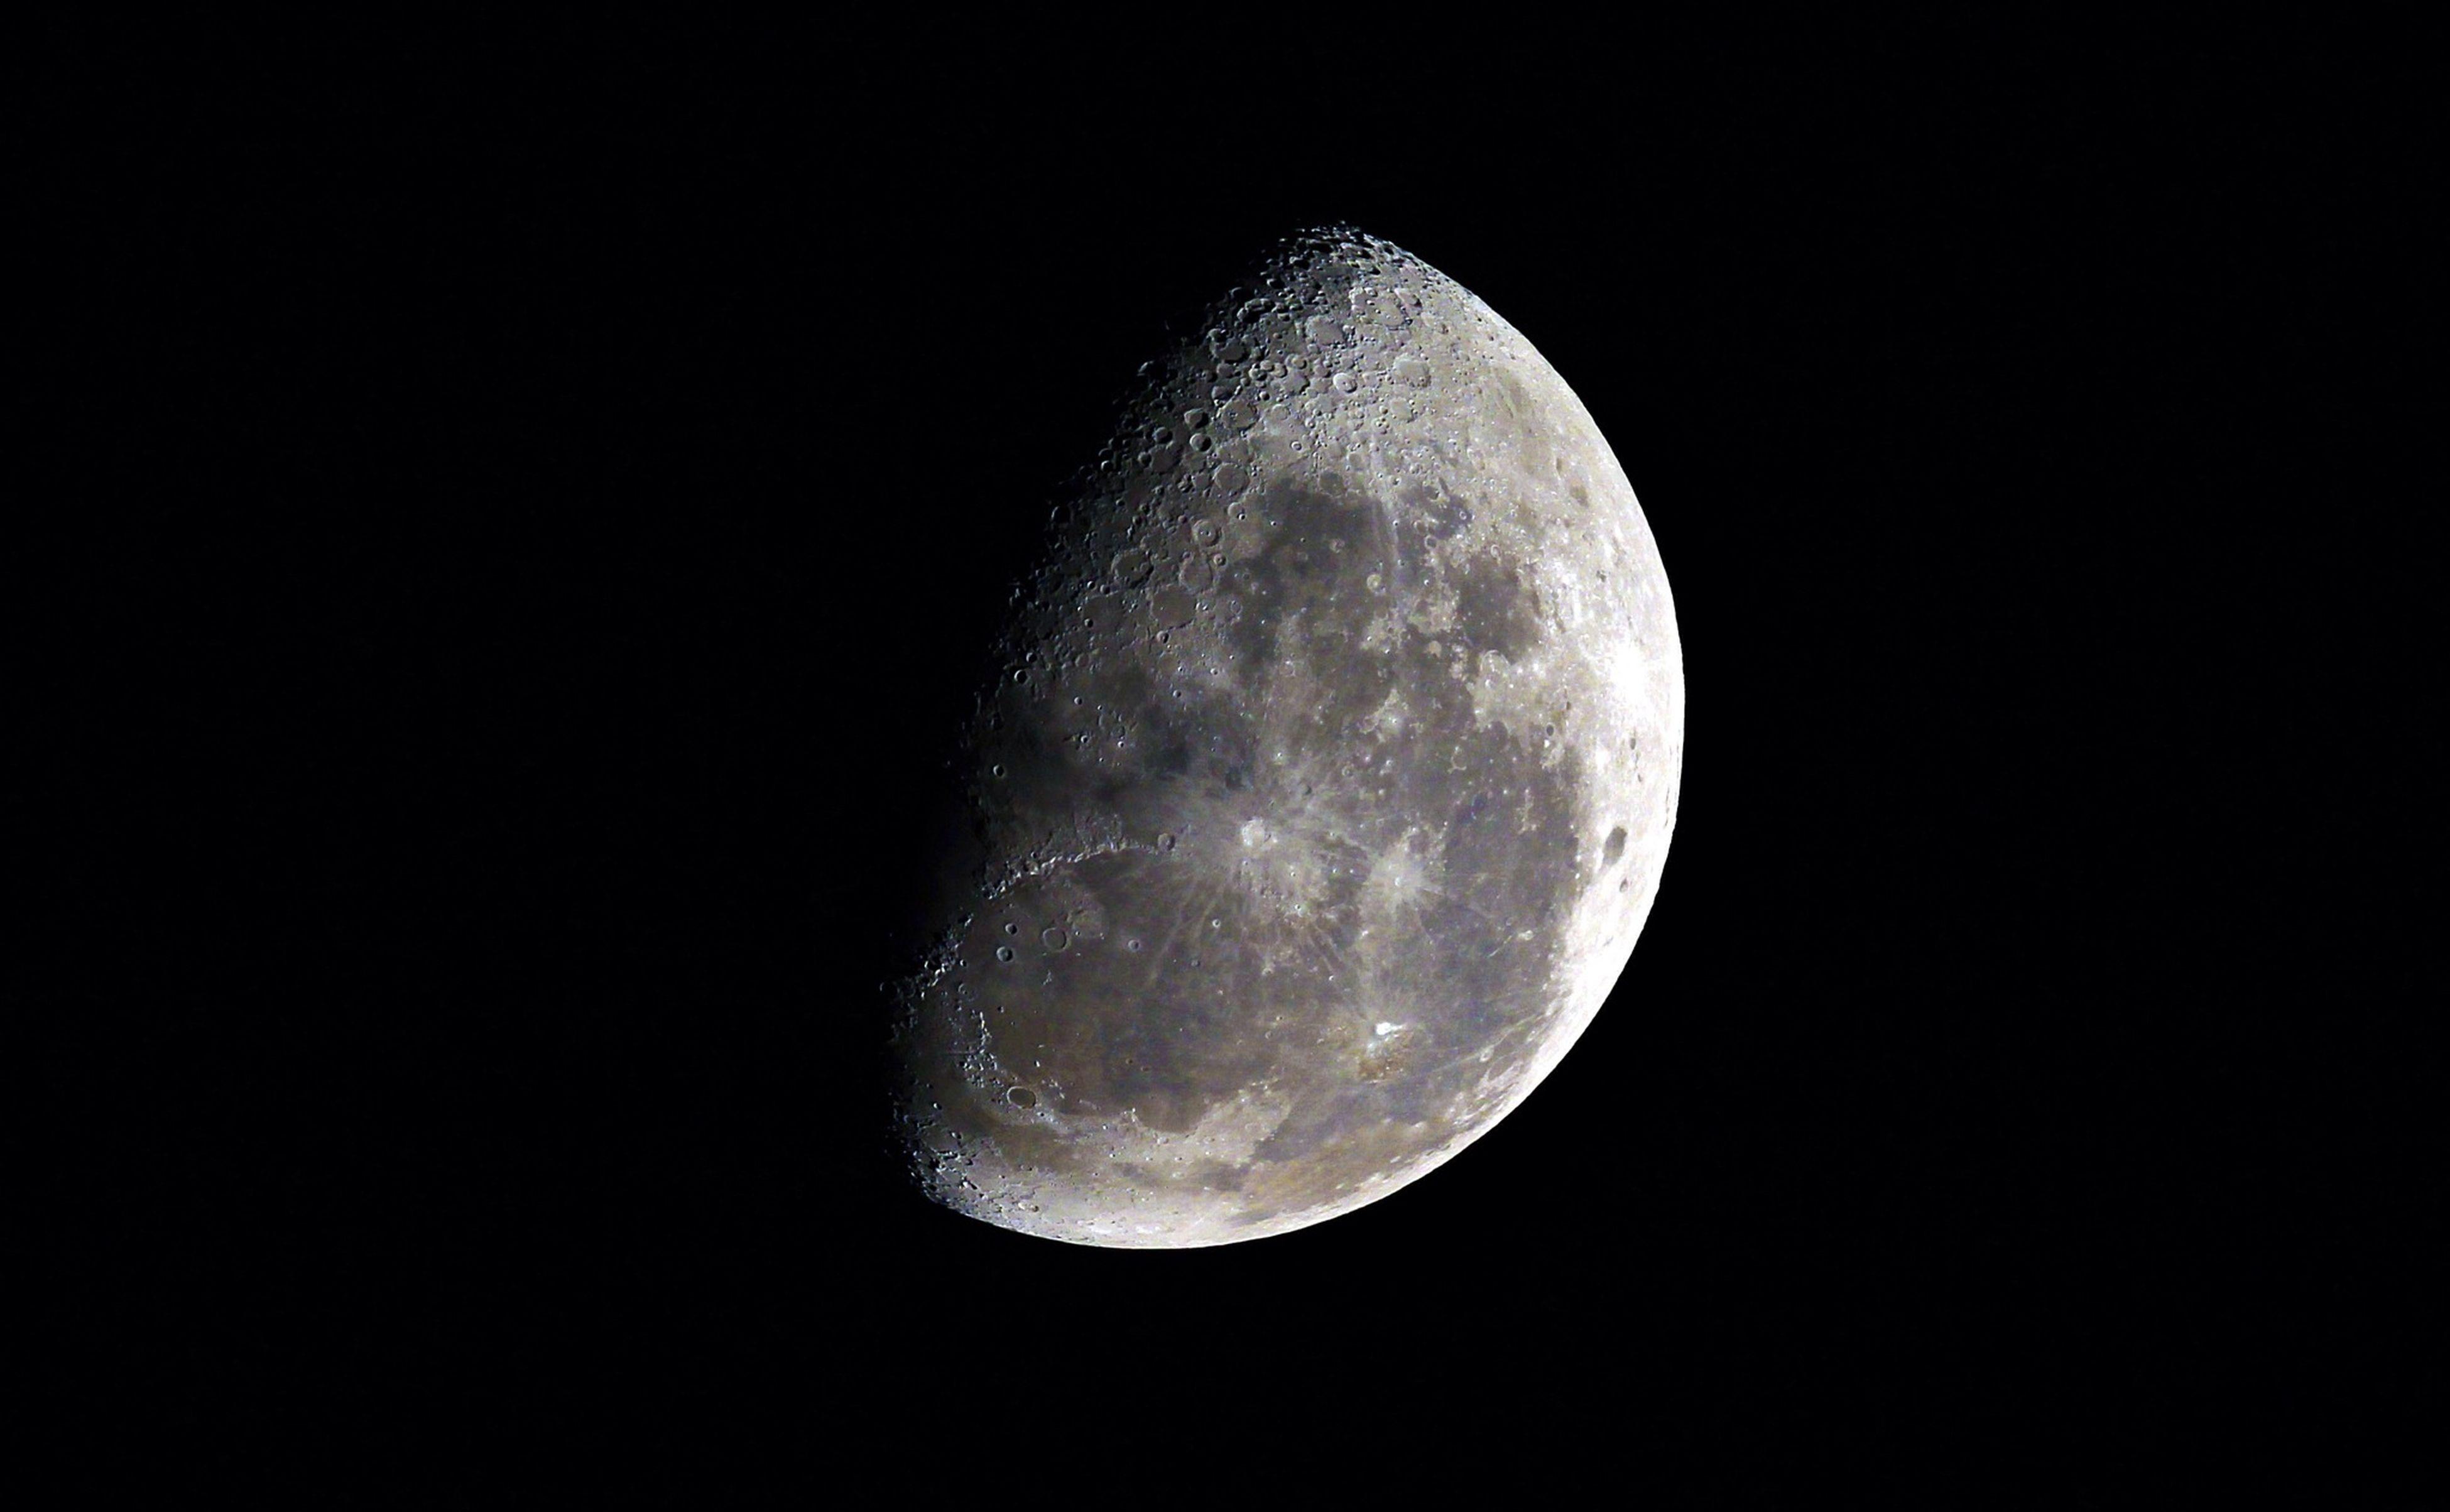 Perfect shot! Moon Selfie Good Nigh ✌